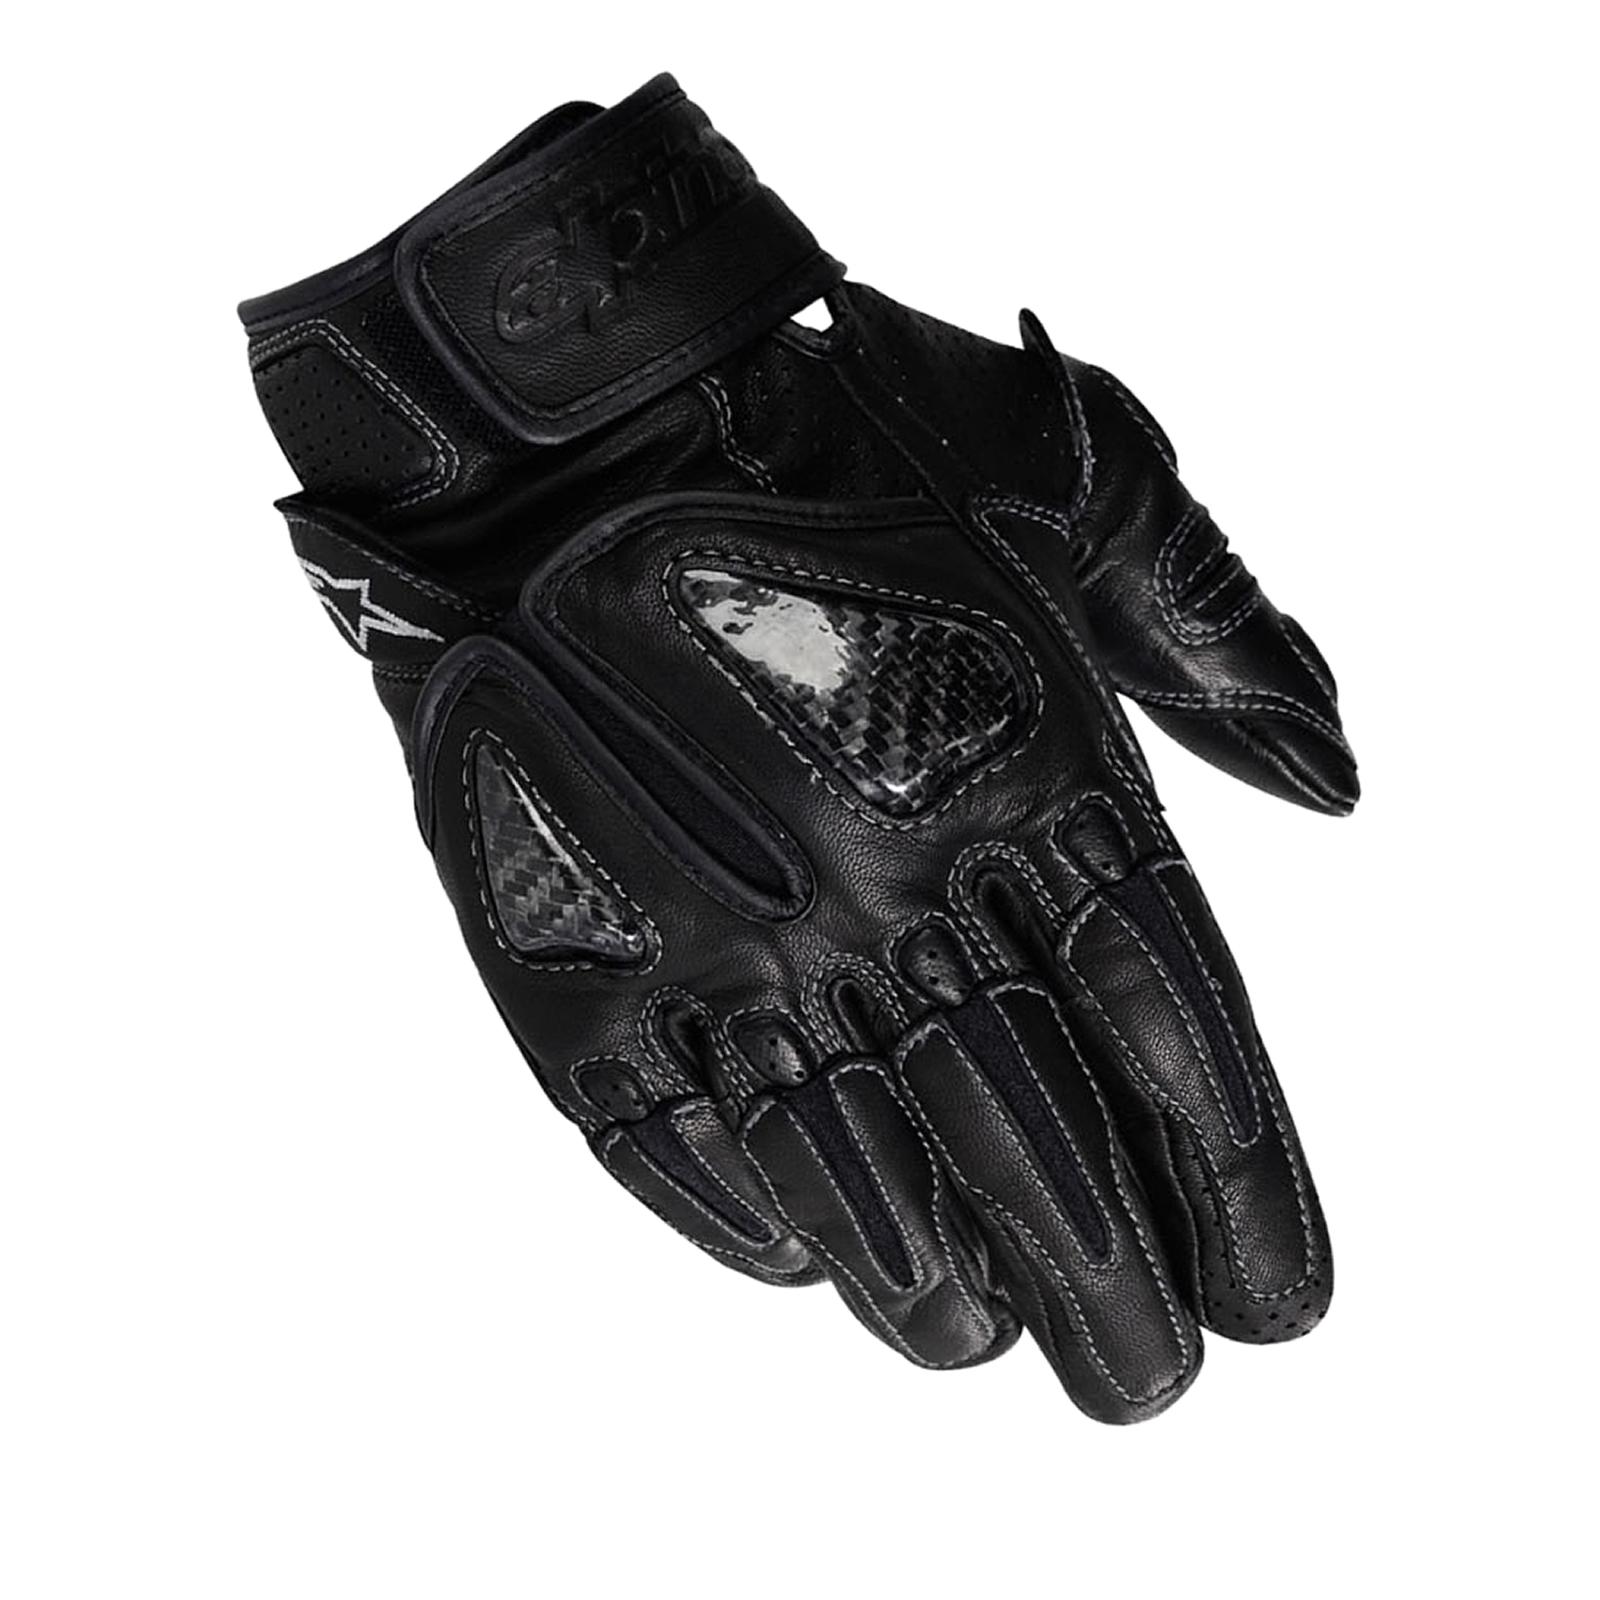 Motorcycle gloves cruiser - Image Is Loading Alpinestars Sps Short Summer Leather Sports Cruiser Motorbike